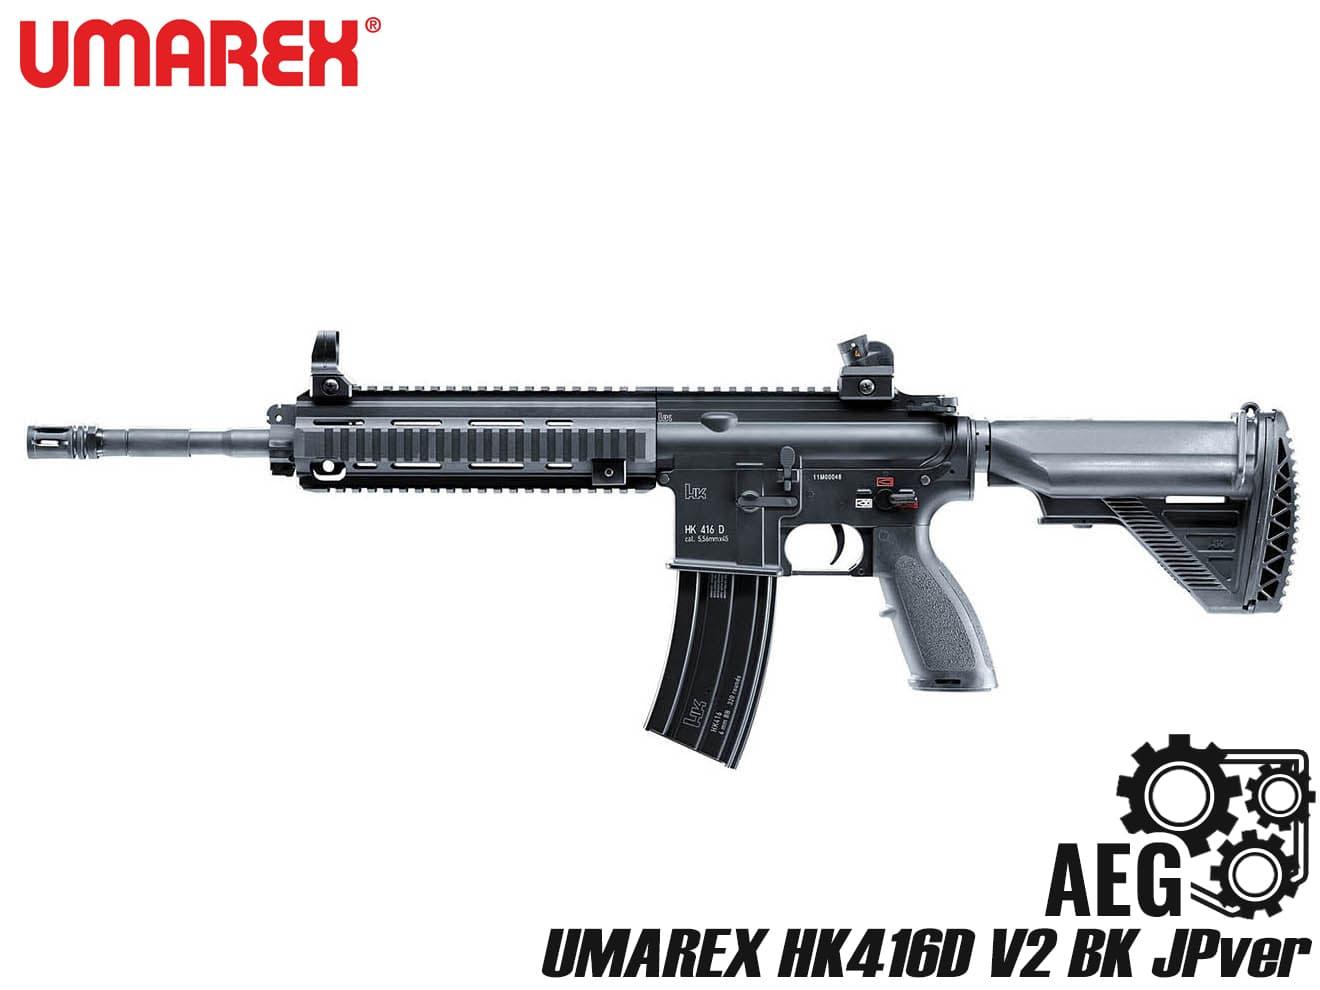 Umarex 電動ガン HK416D V2 BK JPバージョン HK ライセンス◆VFC/ウマレックス/正式ライセンス/AEG/送料無料/デブグル